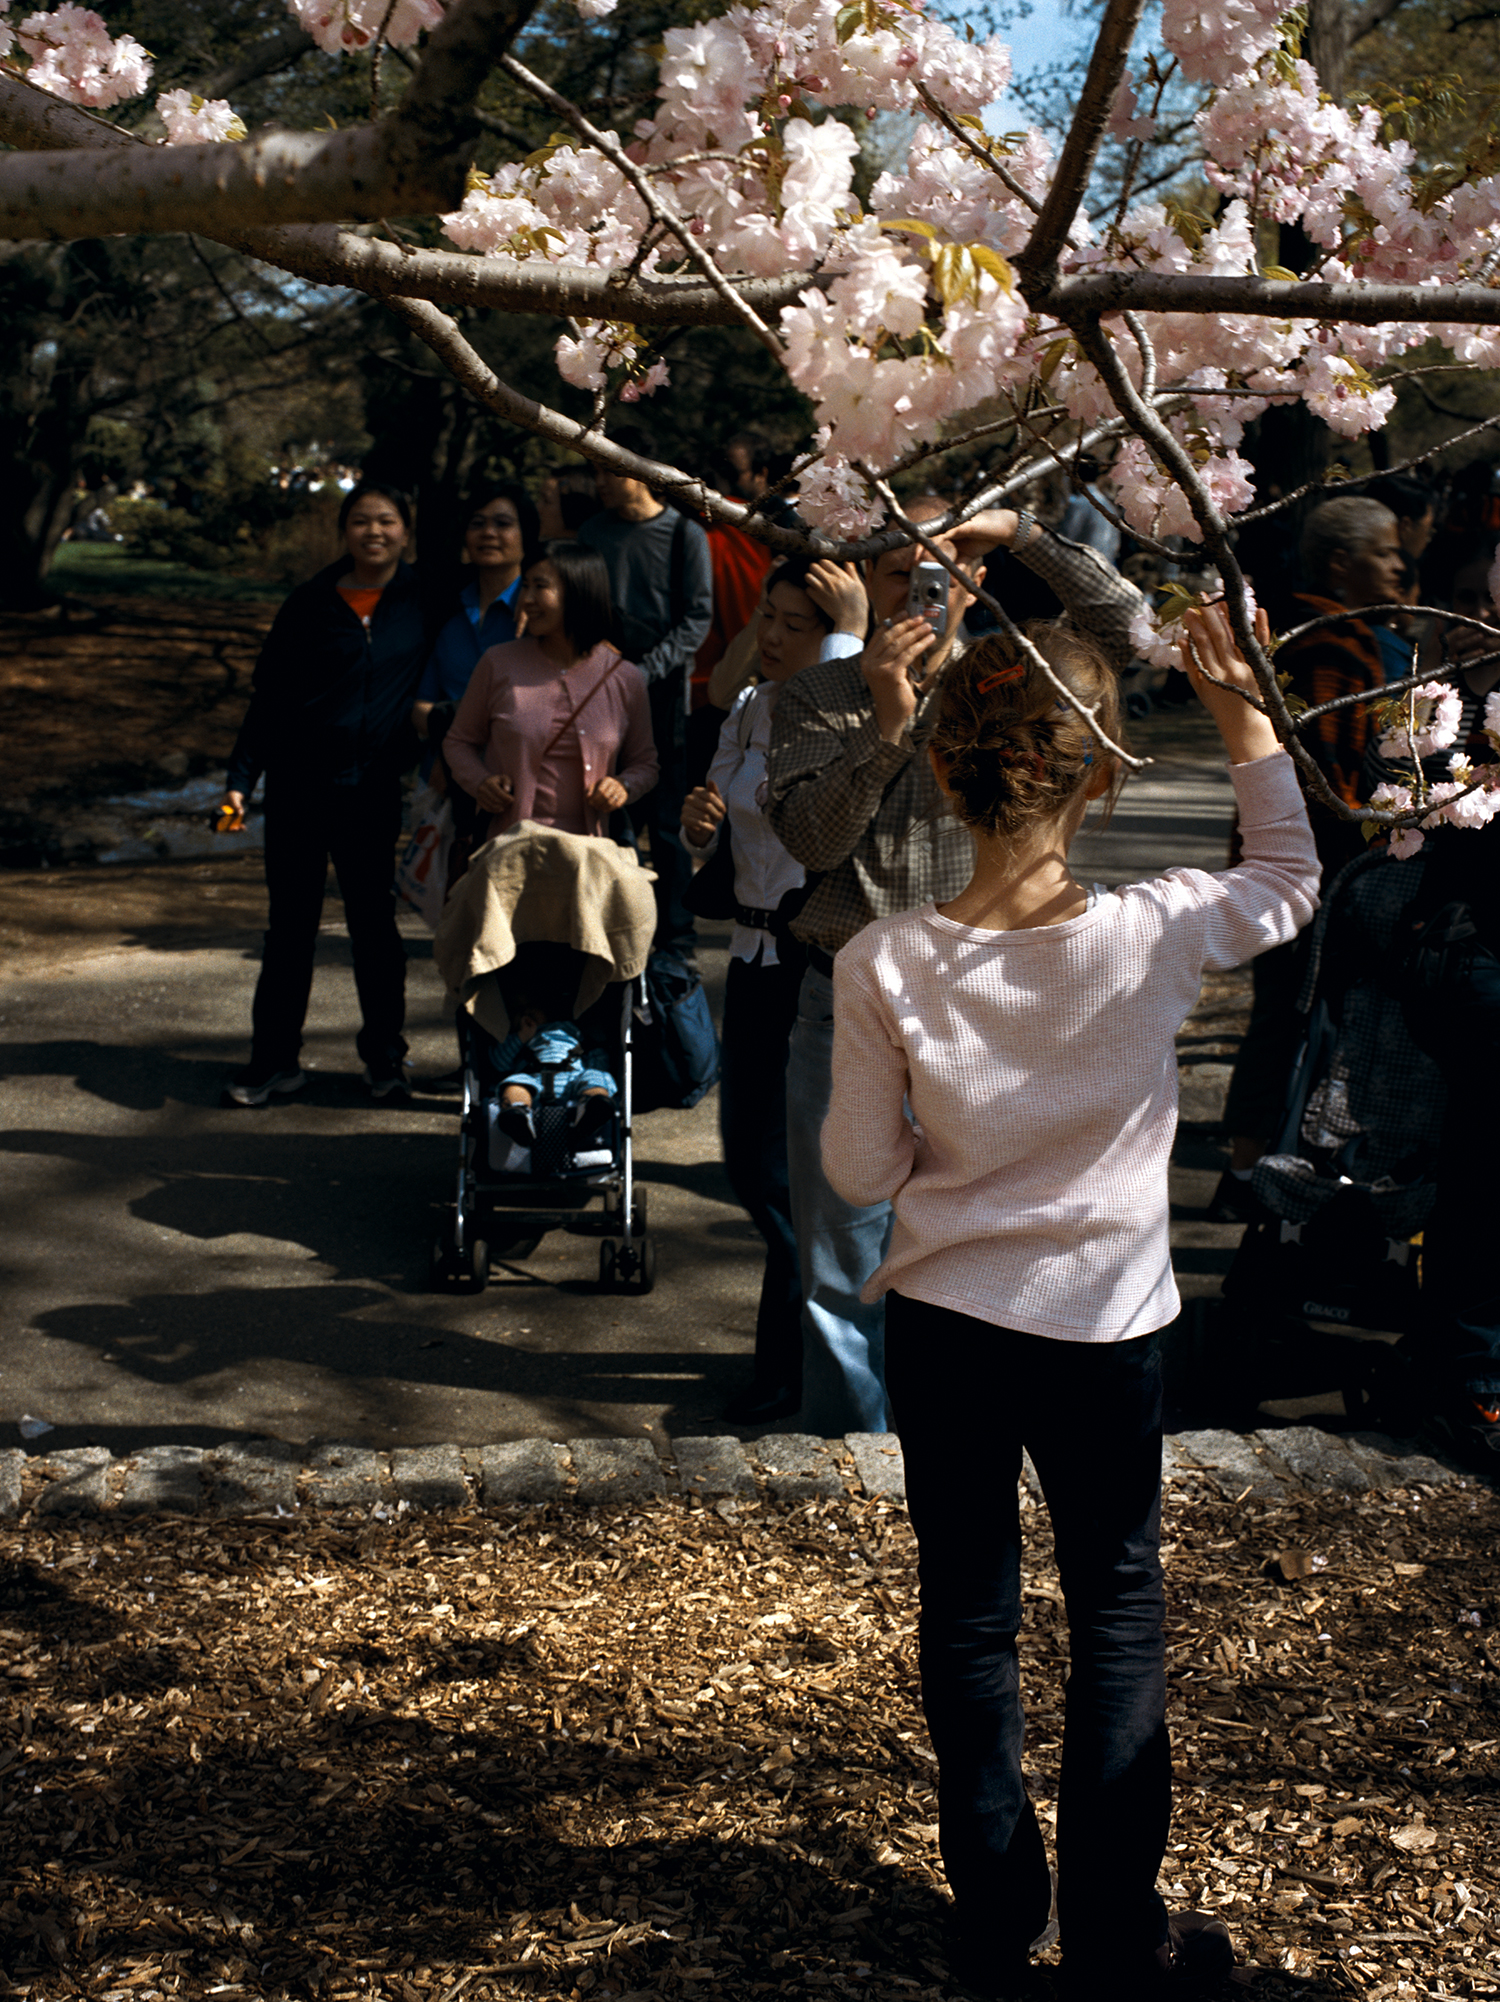 Brooklyn Botanic Garden, New York, 2003